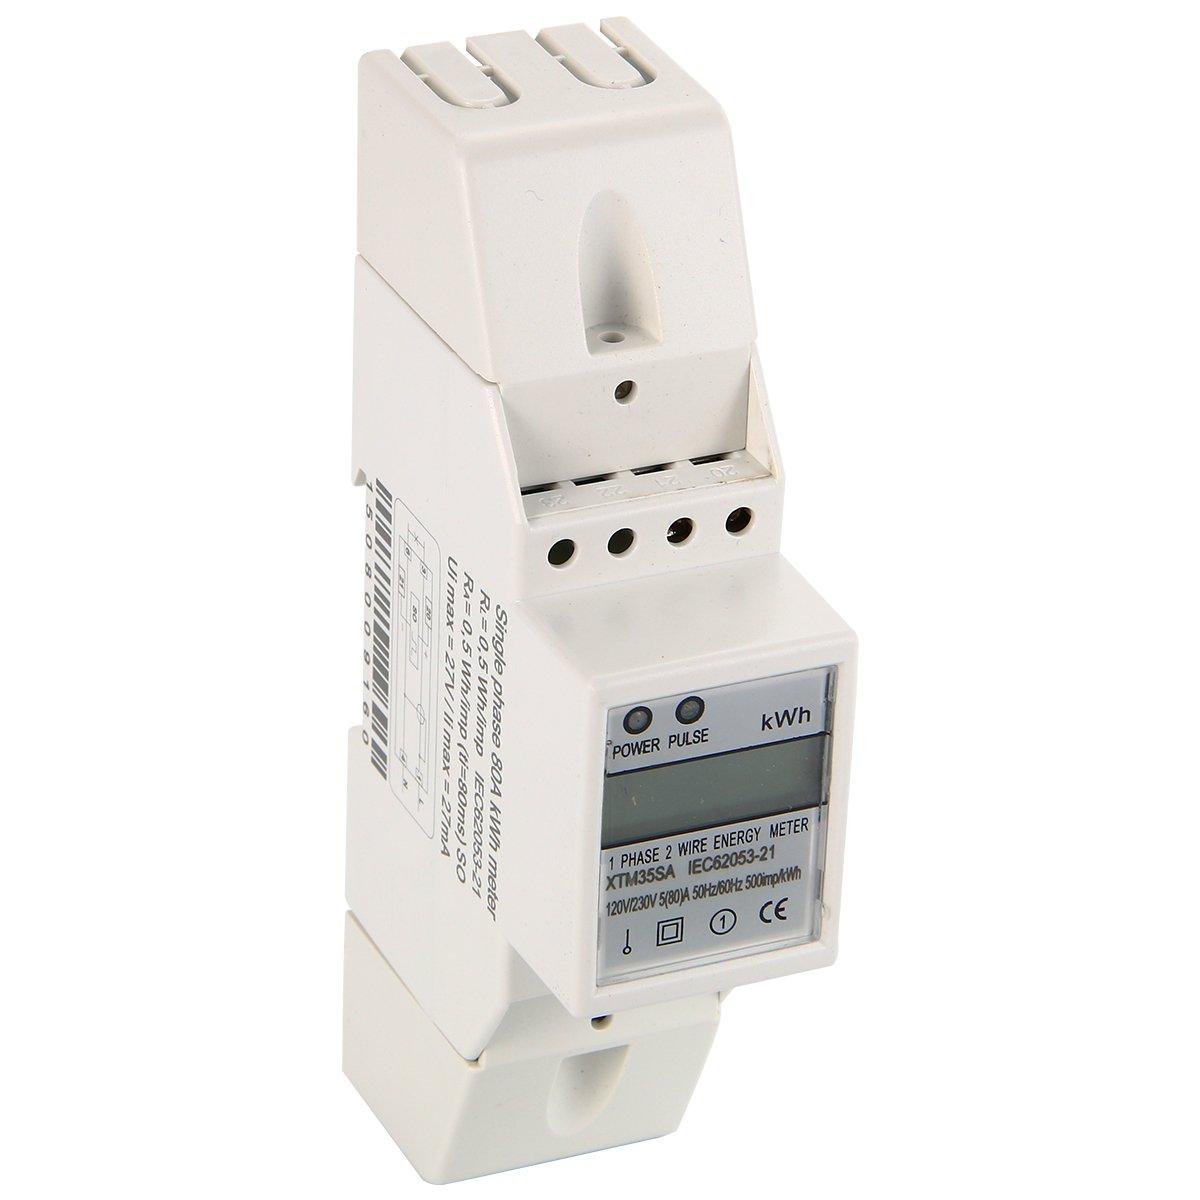 Baym 580a 120v 60hz Single Phase Din Rail Kwh Watt Hour 100v 1 Wiring Diagram Energy Meter Lcd 80a Industrial Scientific